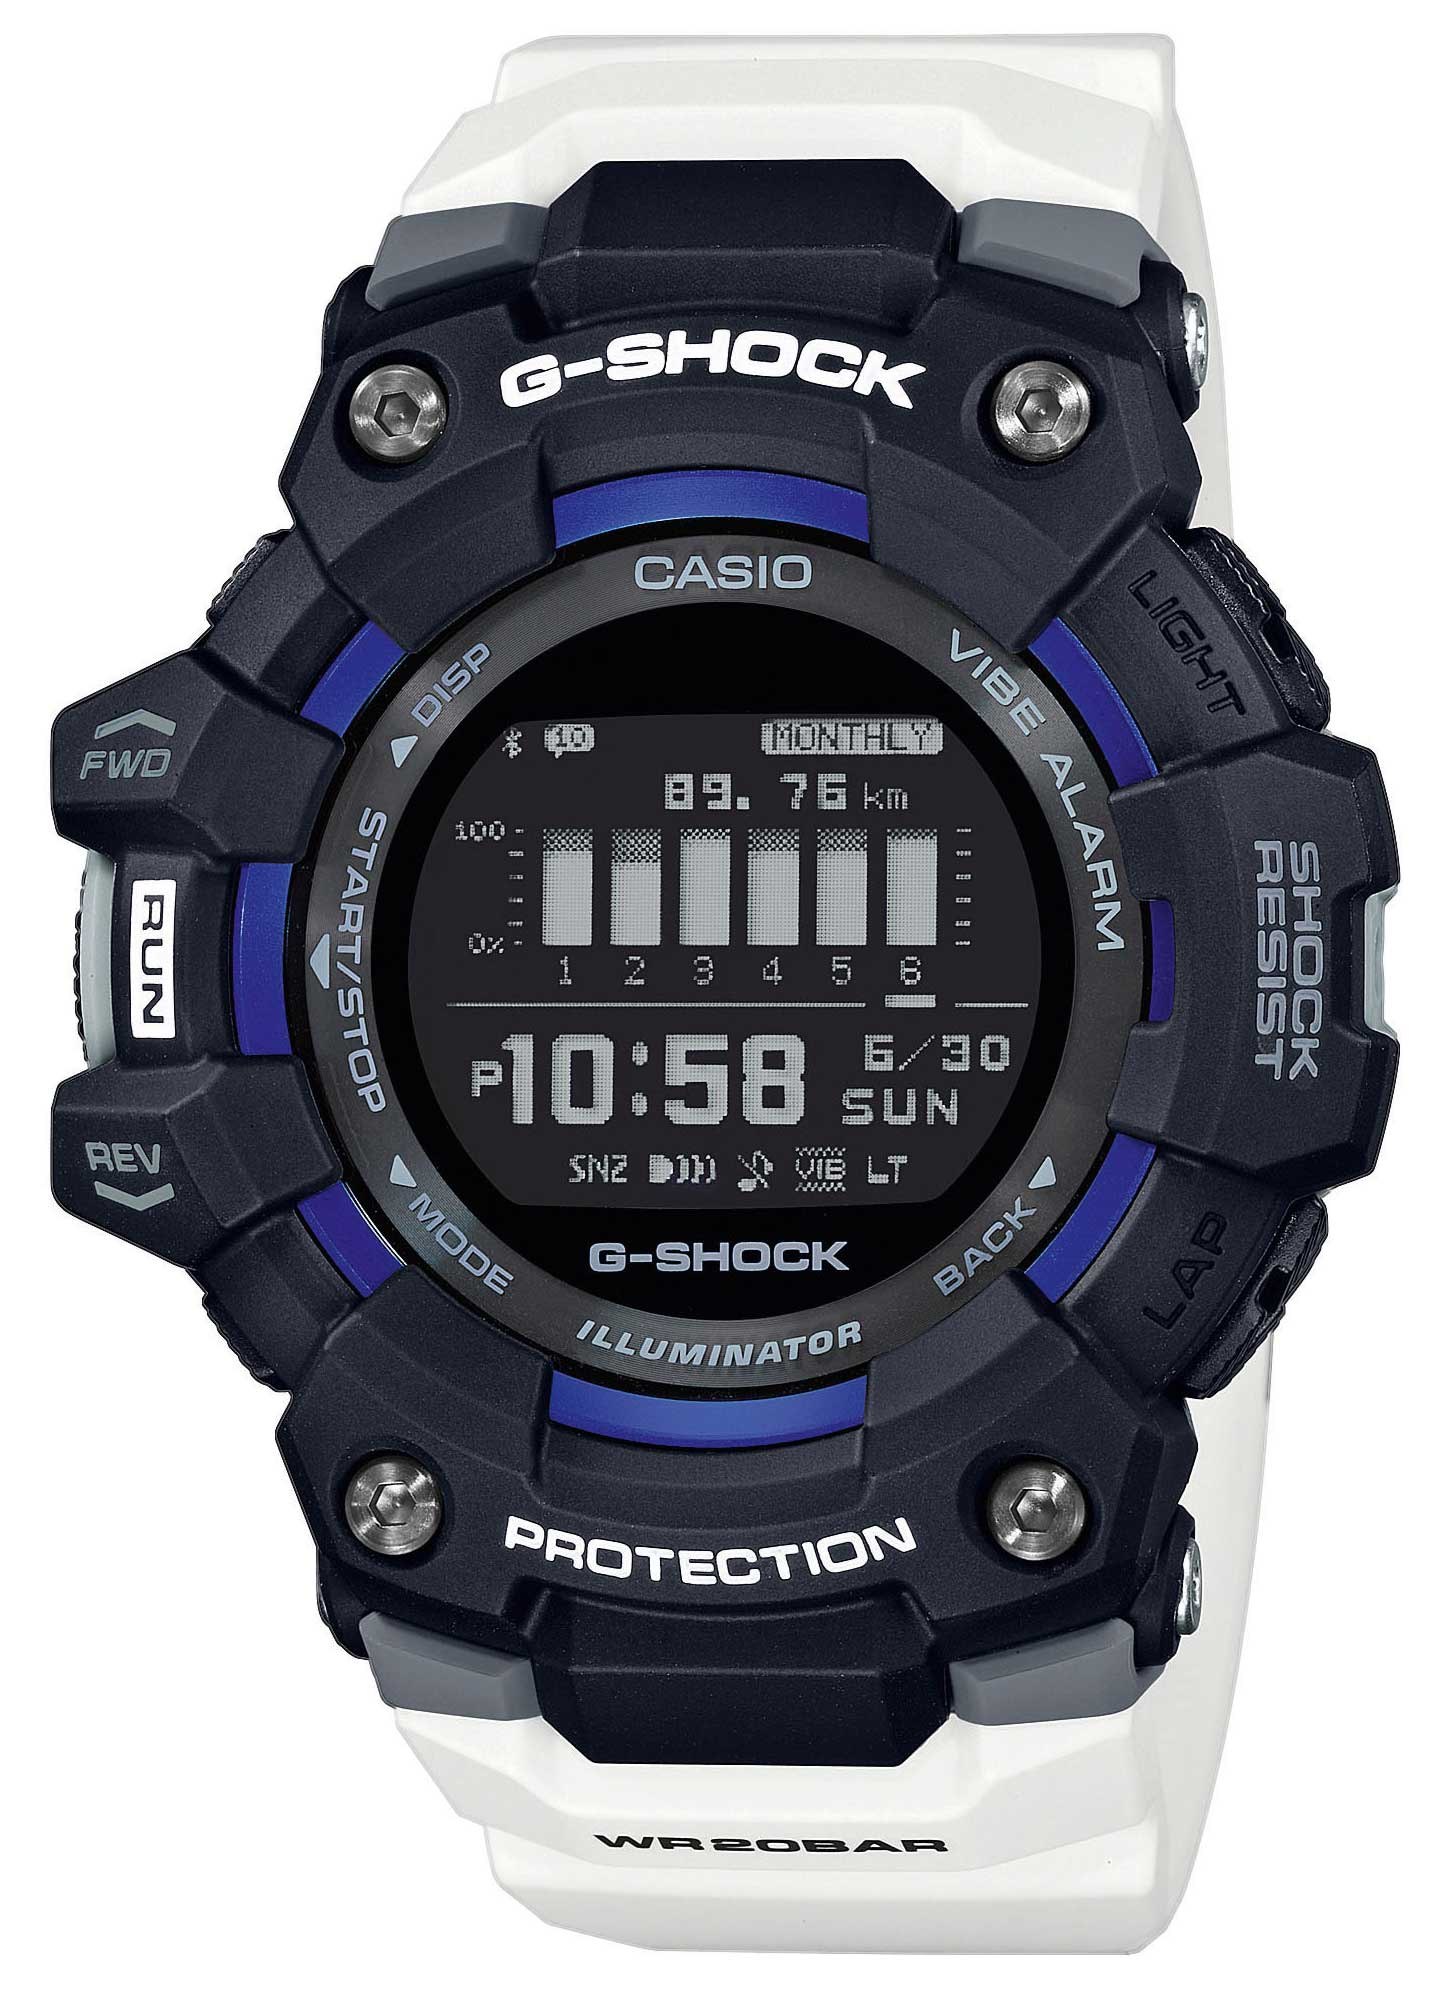 G-Shock Casio Armbanduhr GBD-100-1A7ER Casio Watch